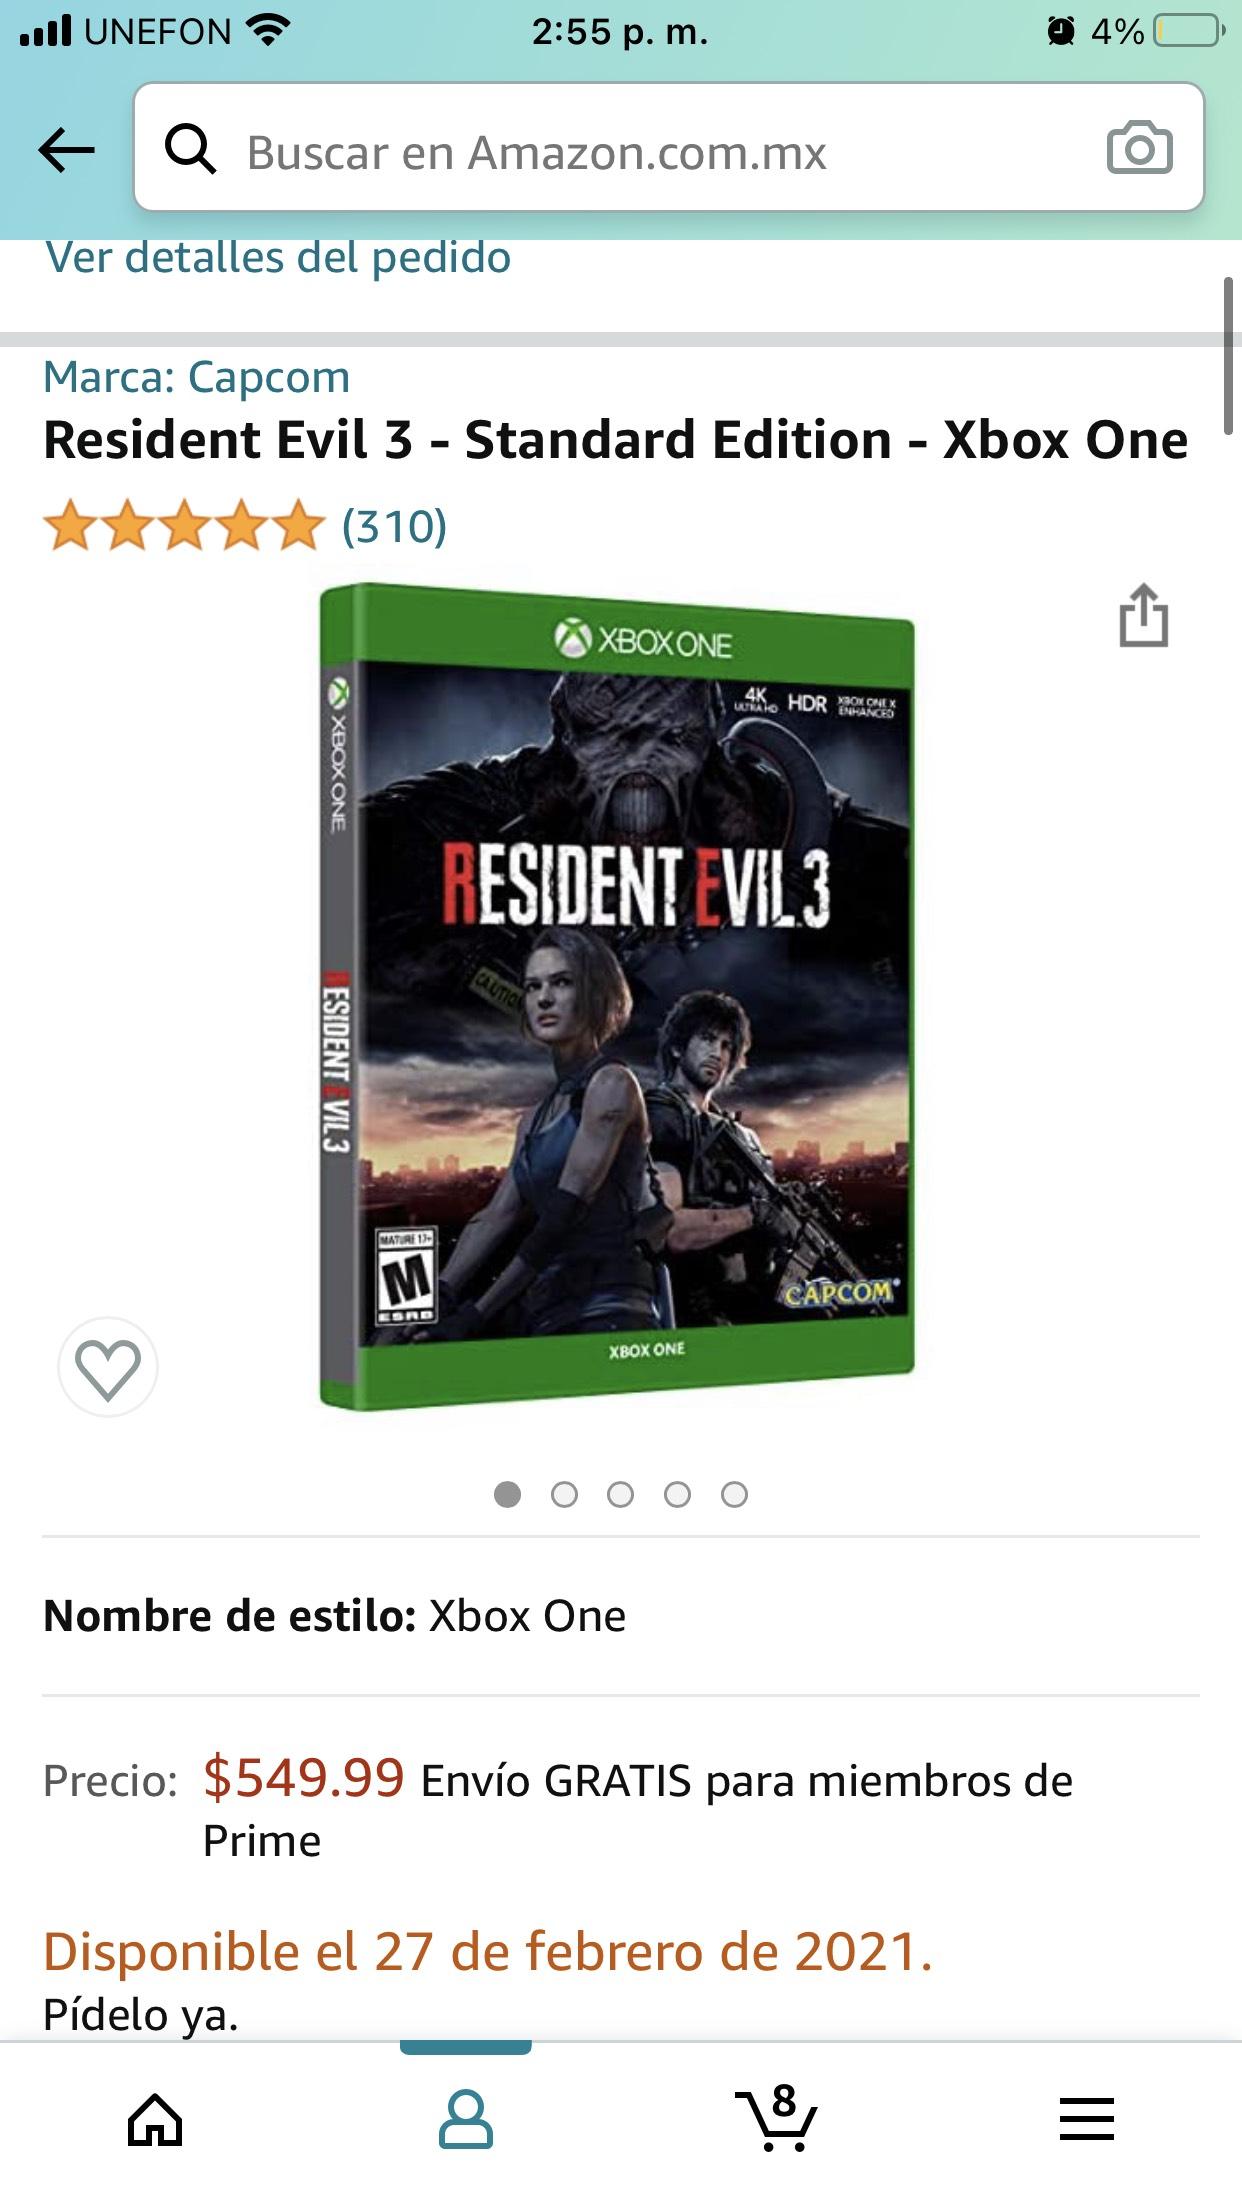 Amazon: Resident Evil 3 - Standard Edition - Xbox One